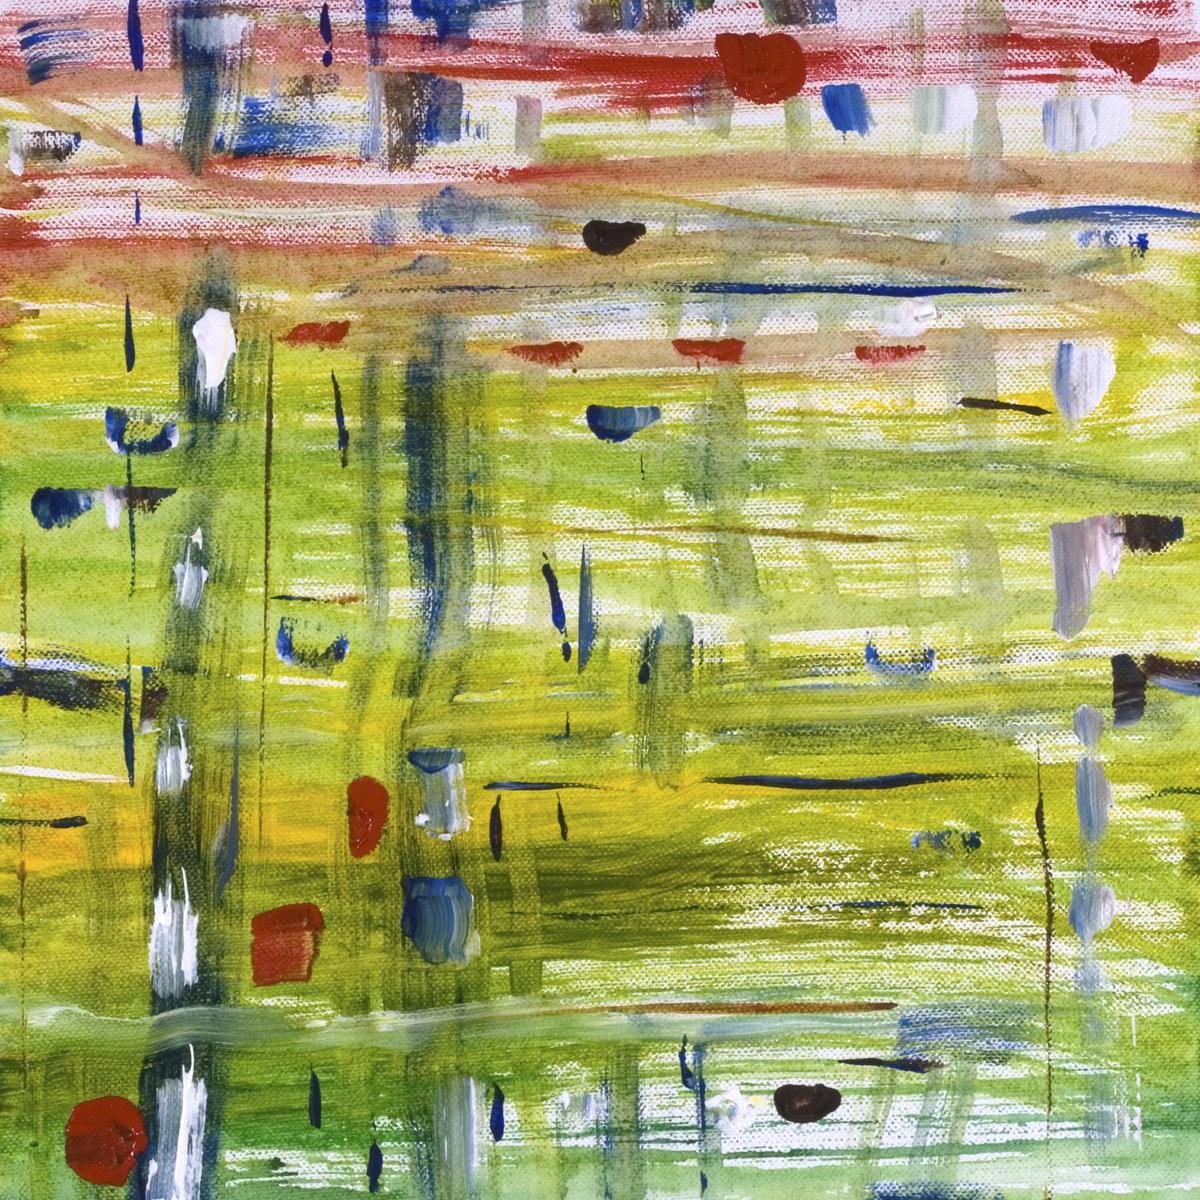 "Reflections  2008 12"" x 12"" Acrylic on Canvas"